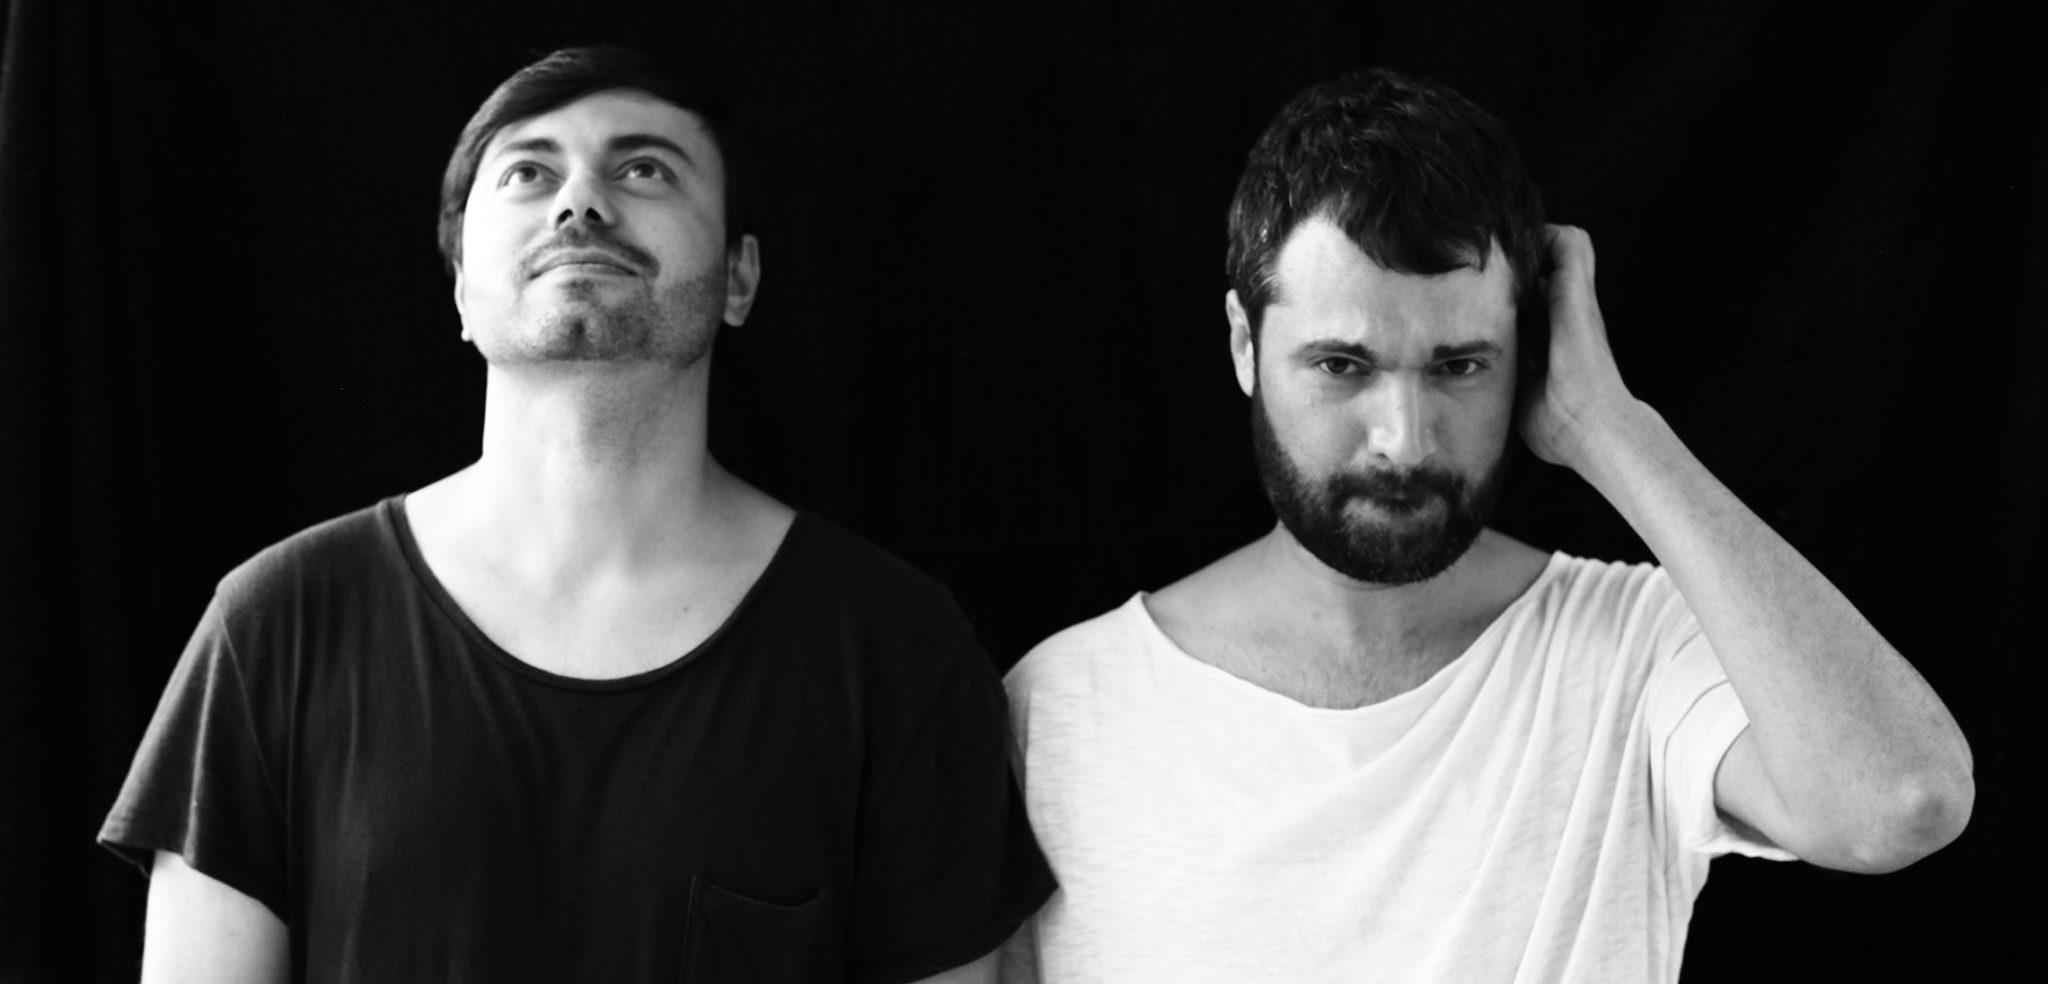 Livio & Roby - Ondul EP hero